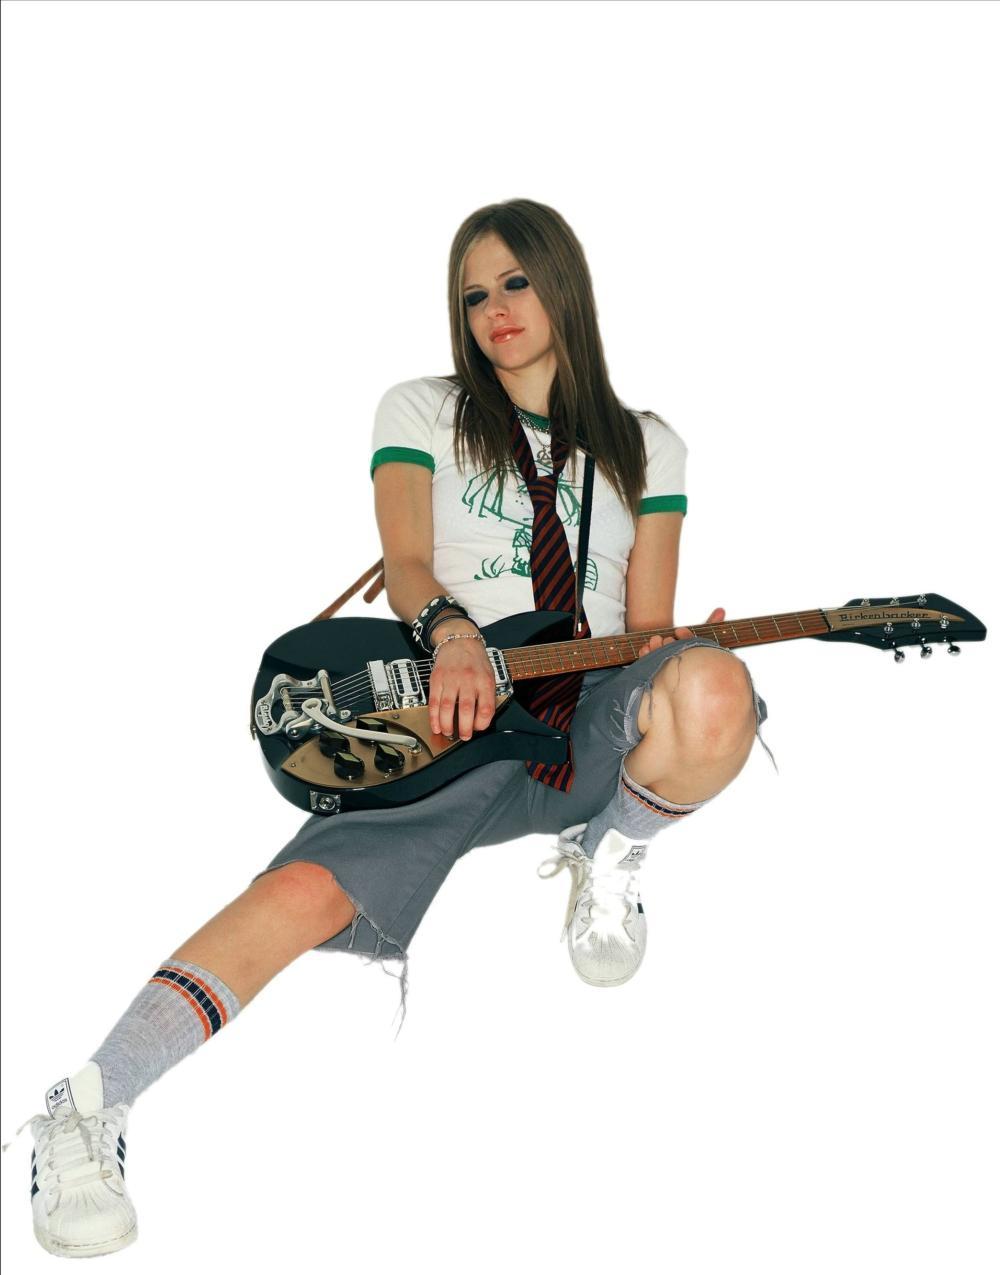 VINDICATED I AM SELFISH: Lyric Daydream - Avril Lavigne Avril Lavigne Daydream